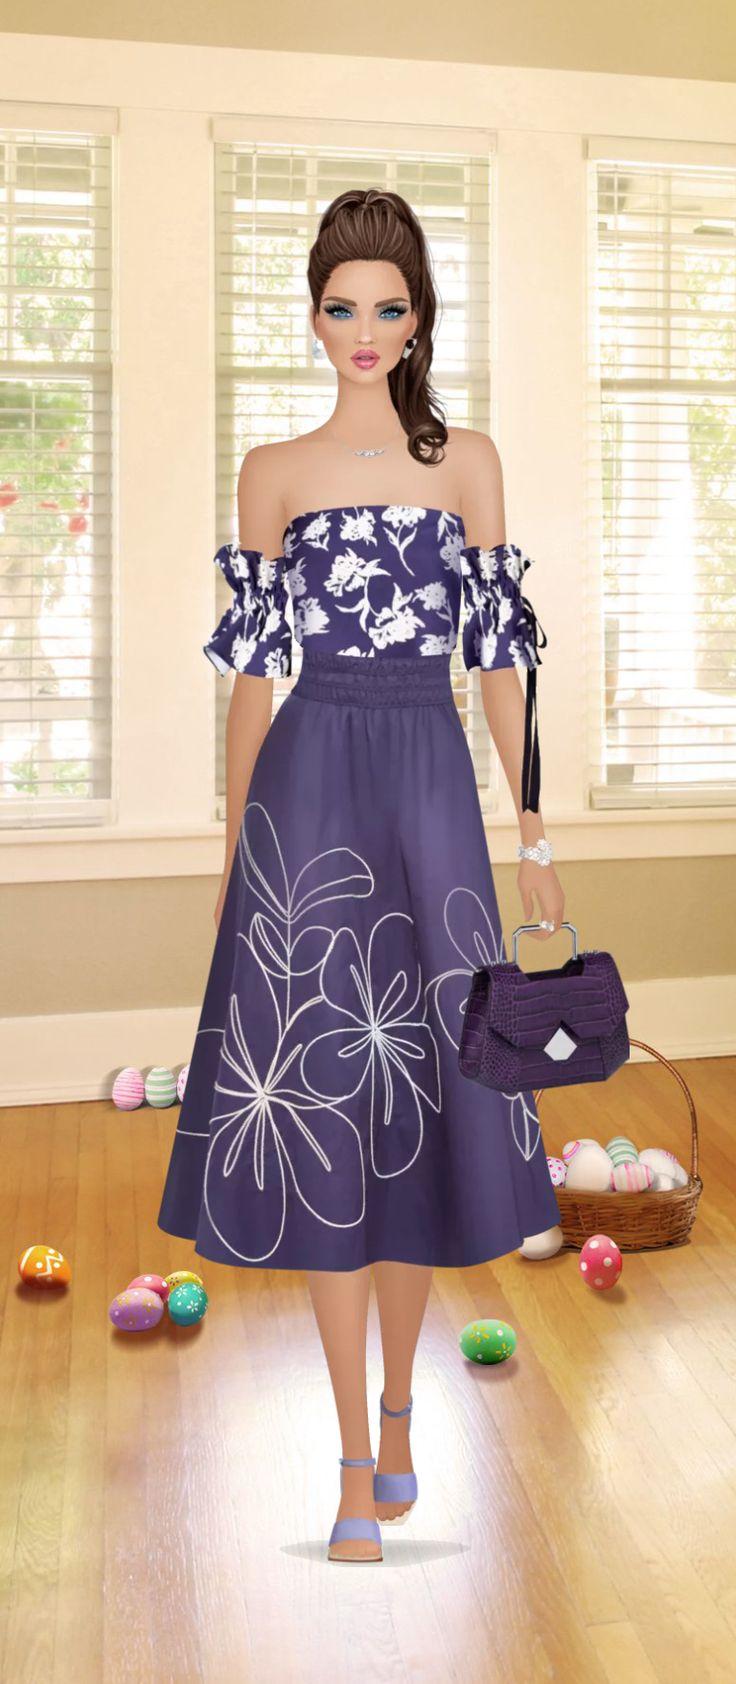 Mejores 258 imágenes de Niñas yuko en Pinterest | Moda infantil ...